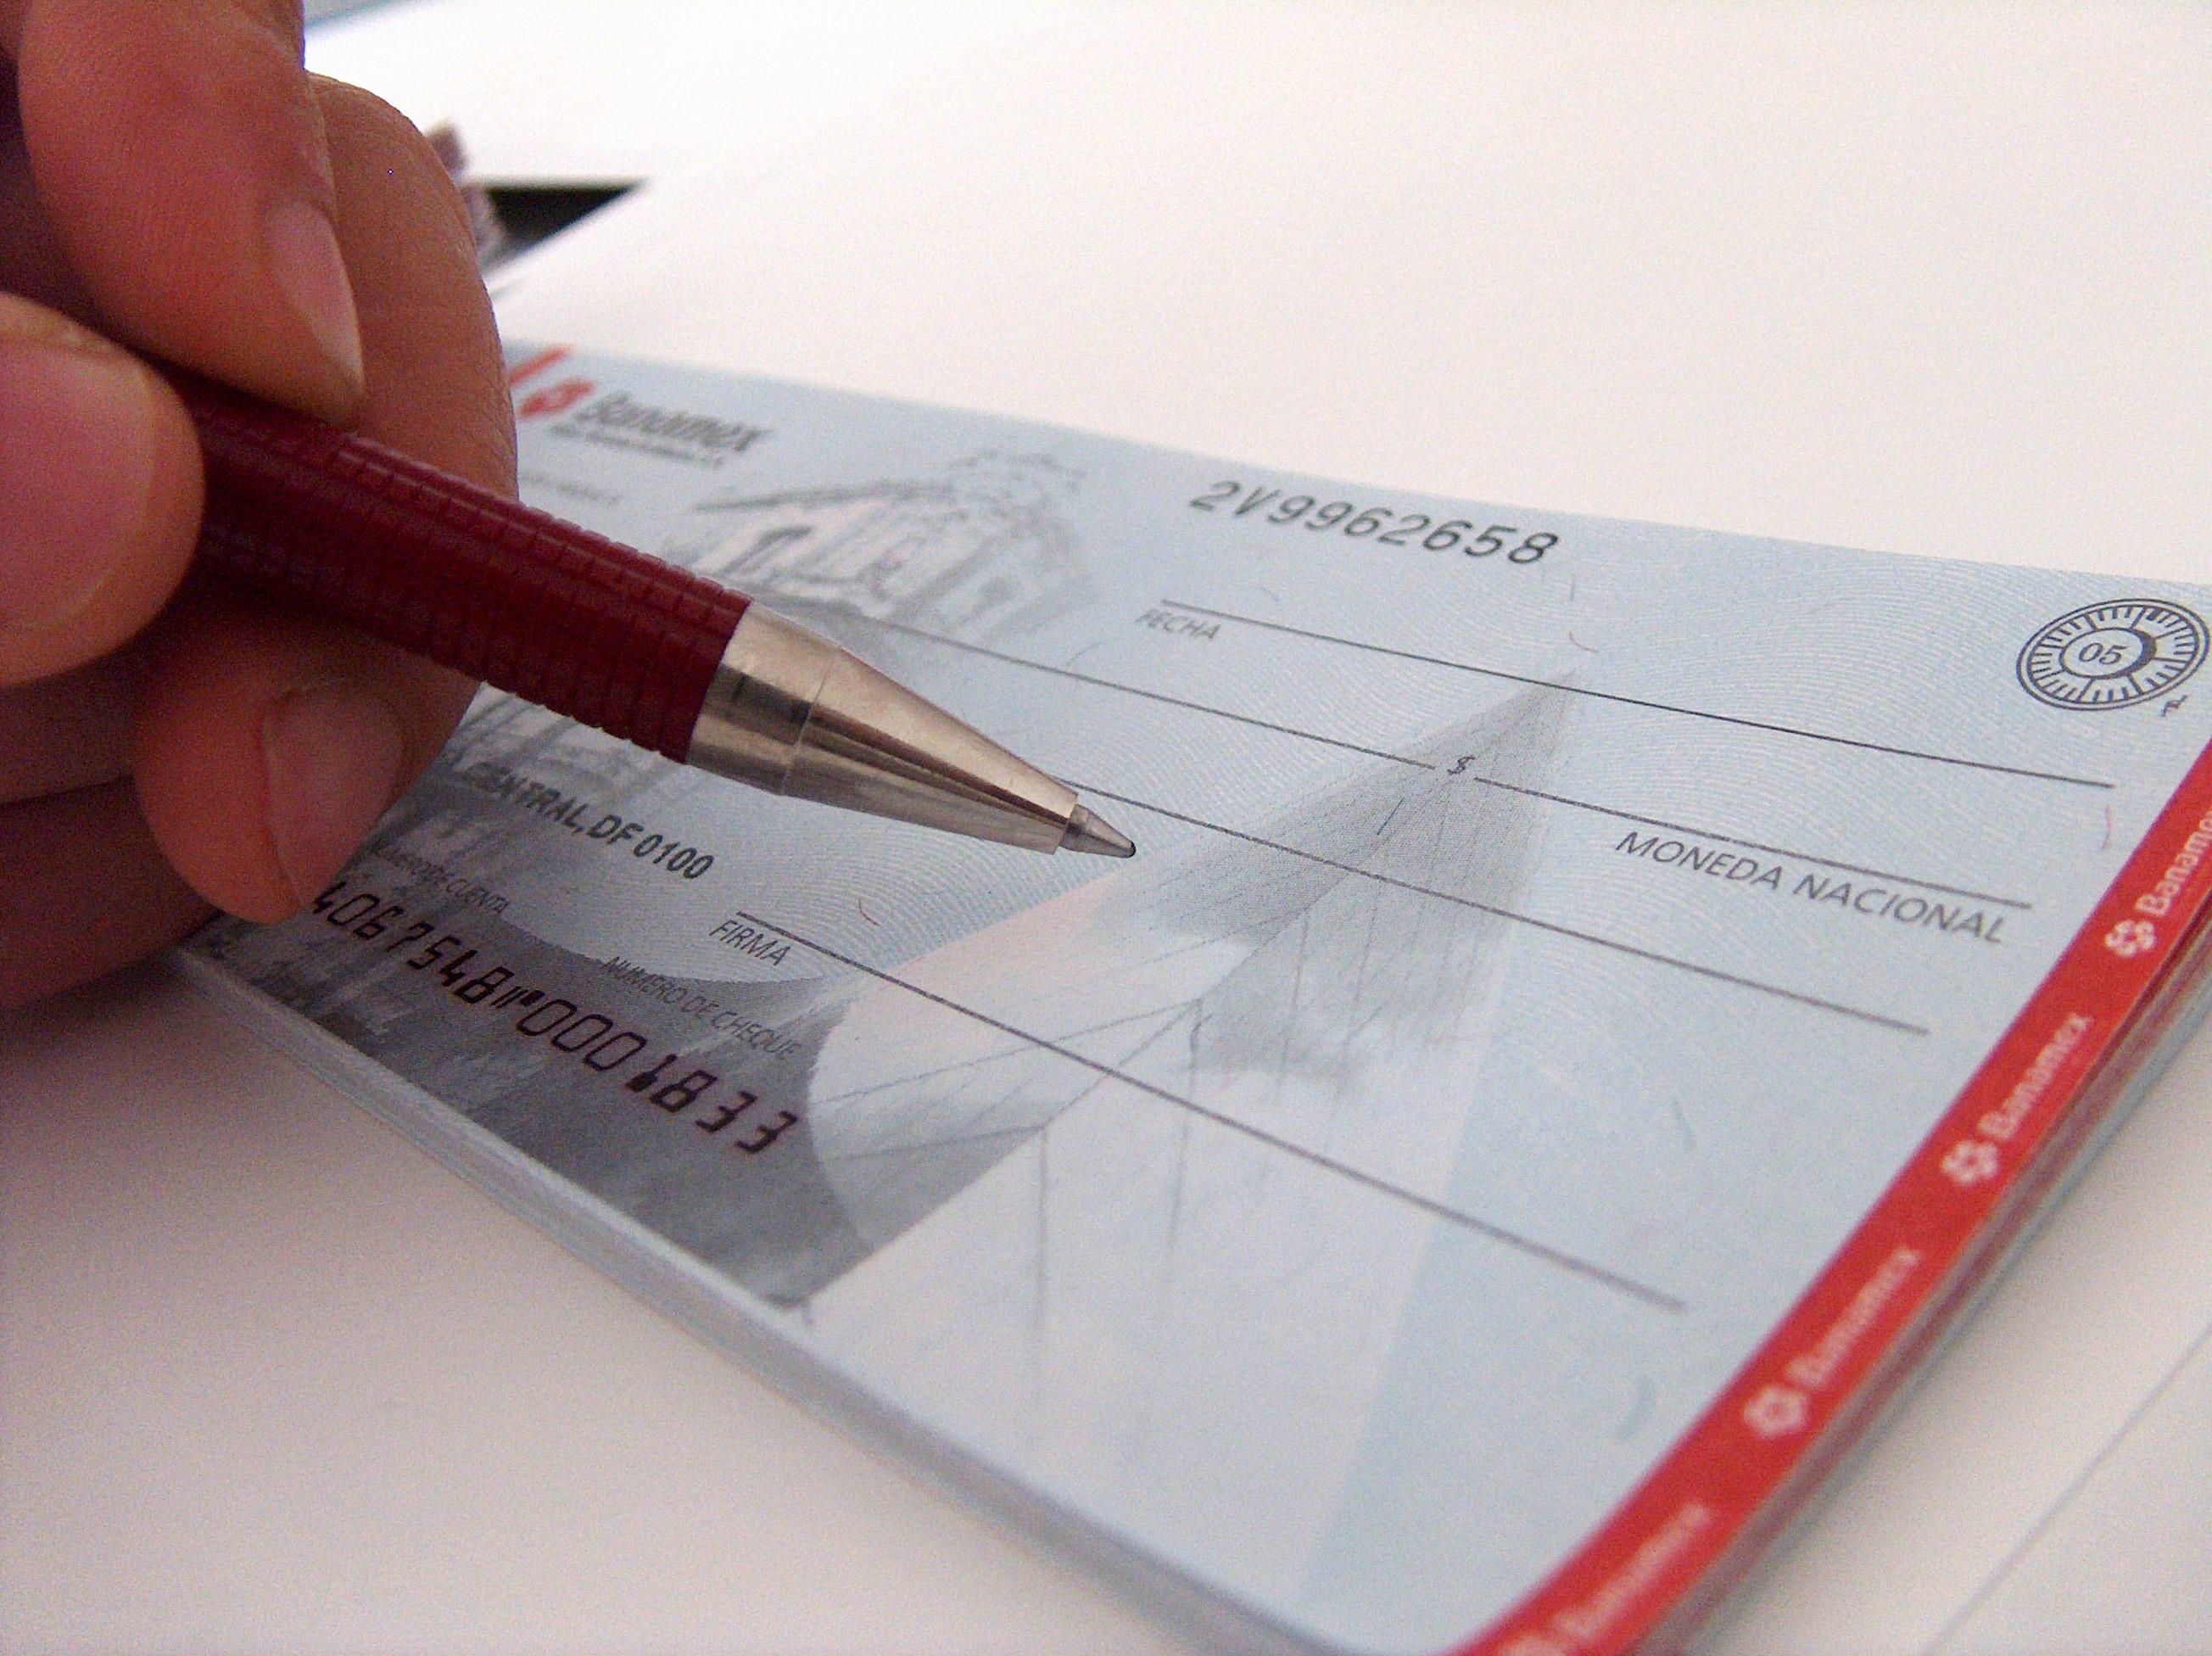 Giro-doloso-de-cheques.jpg